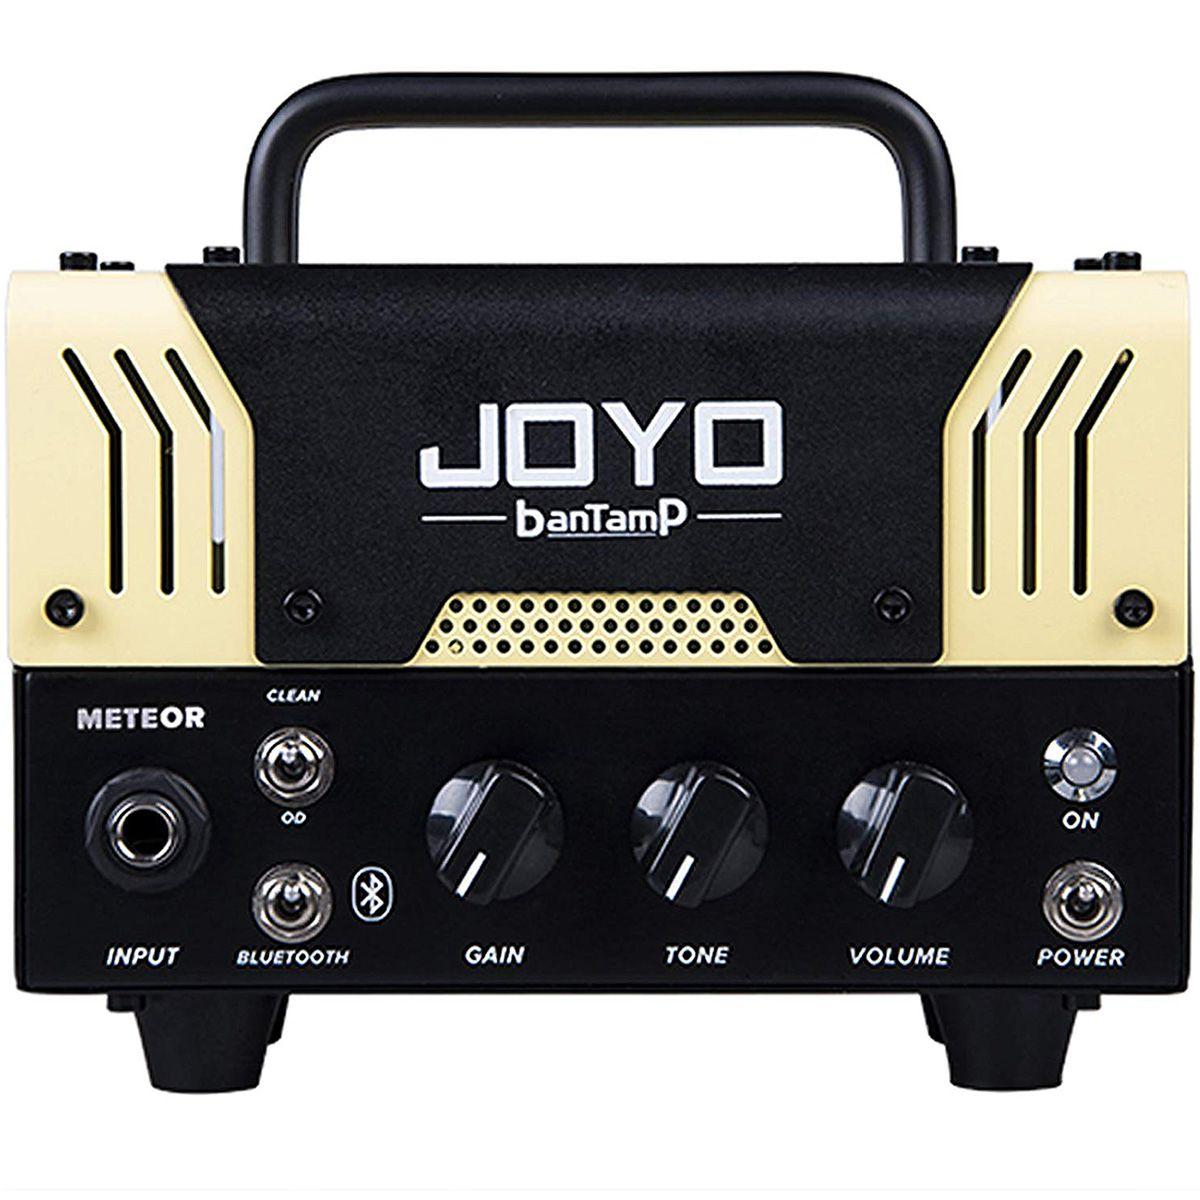 Mini Amplificador Joyo Meteor Bantamp 20w Para Guitarra